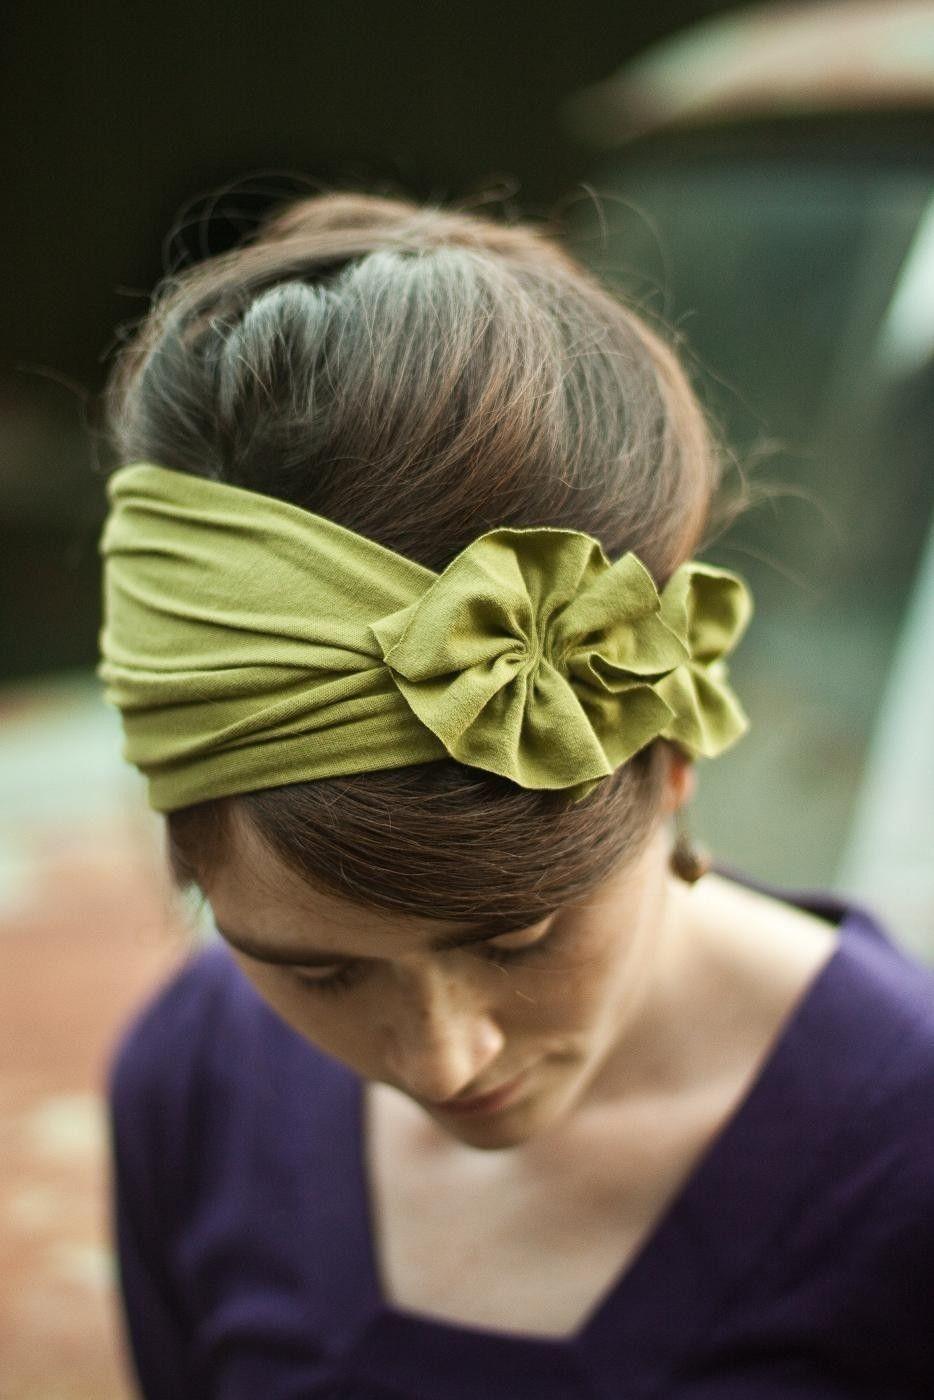 Stretch rosette in rustic green garlands of grace headband hair